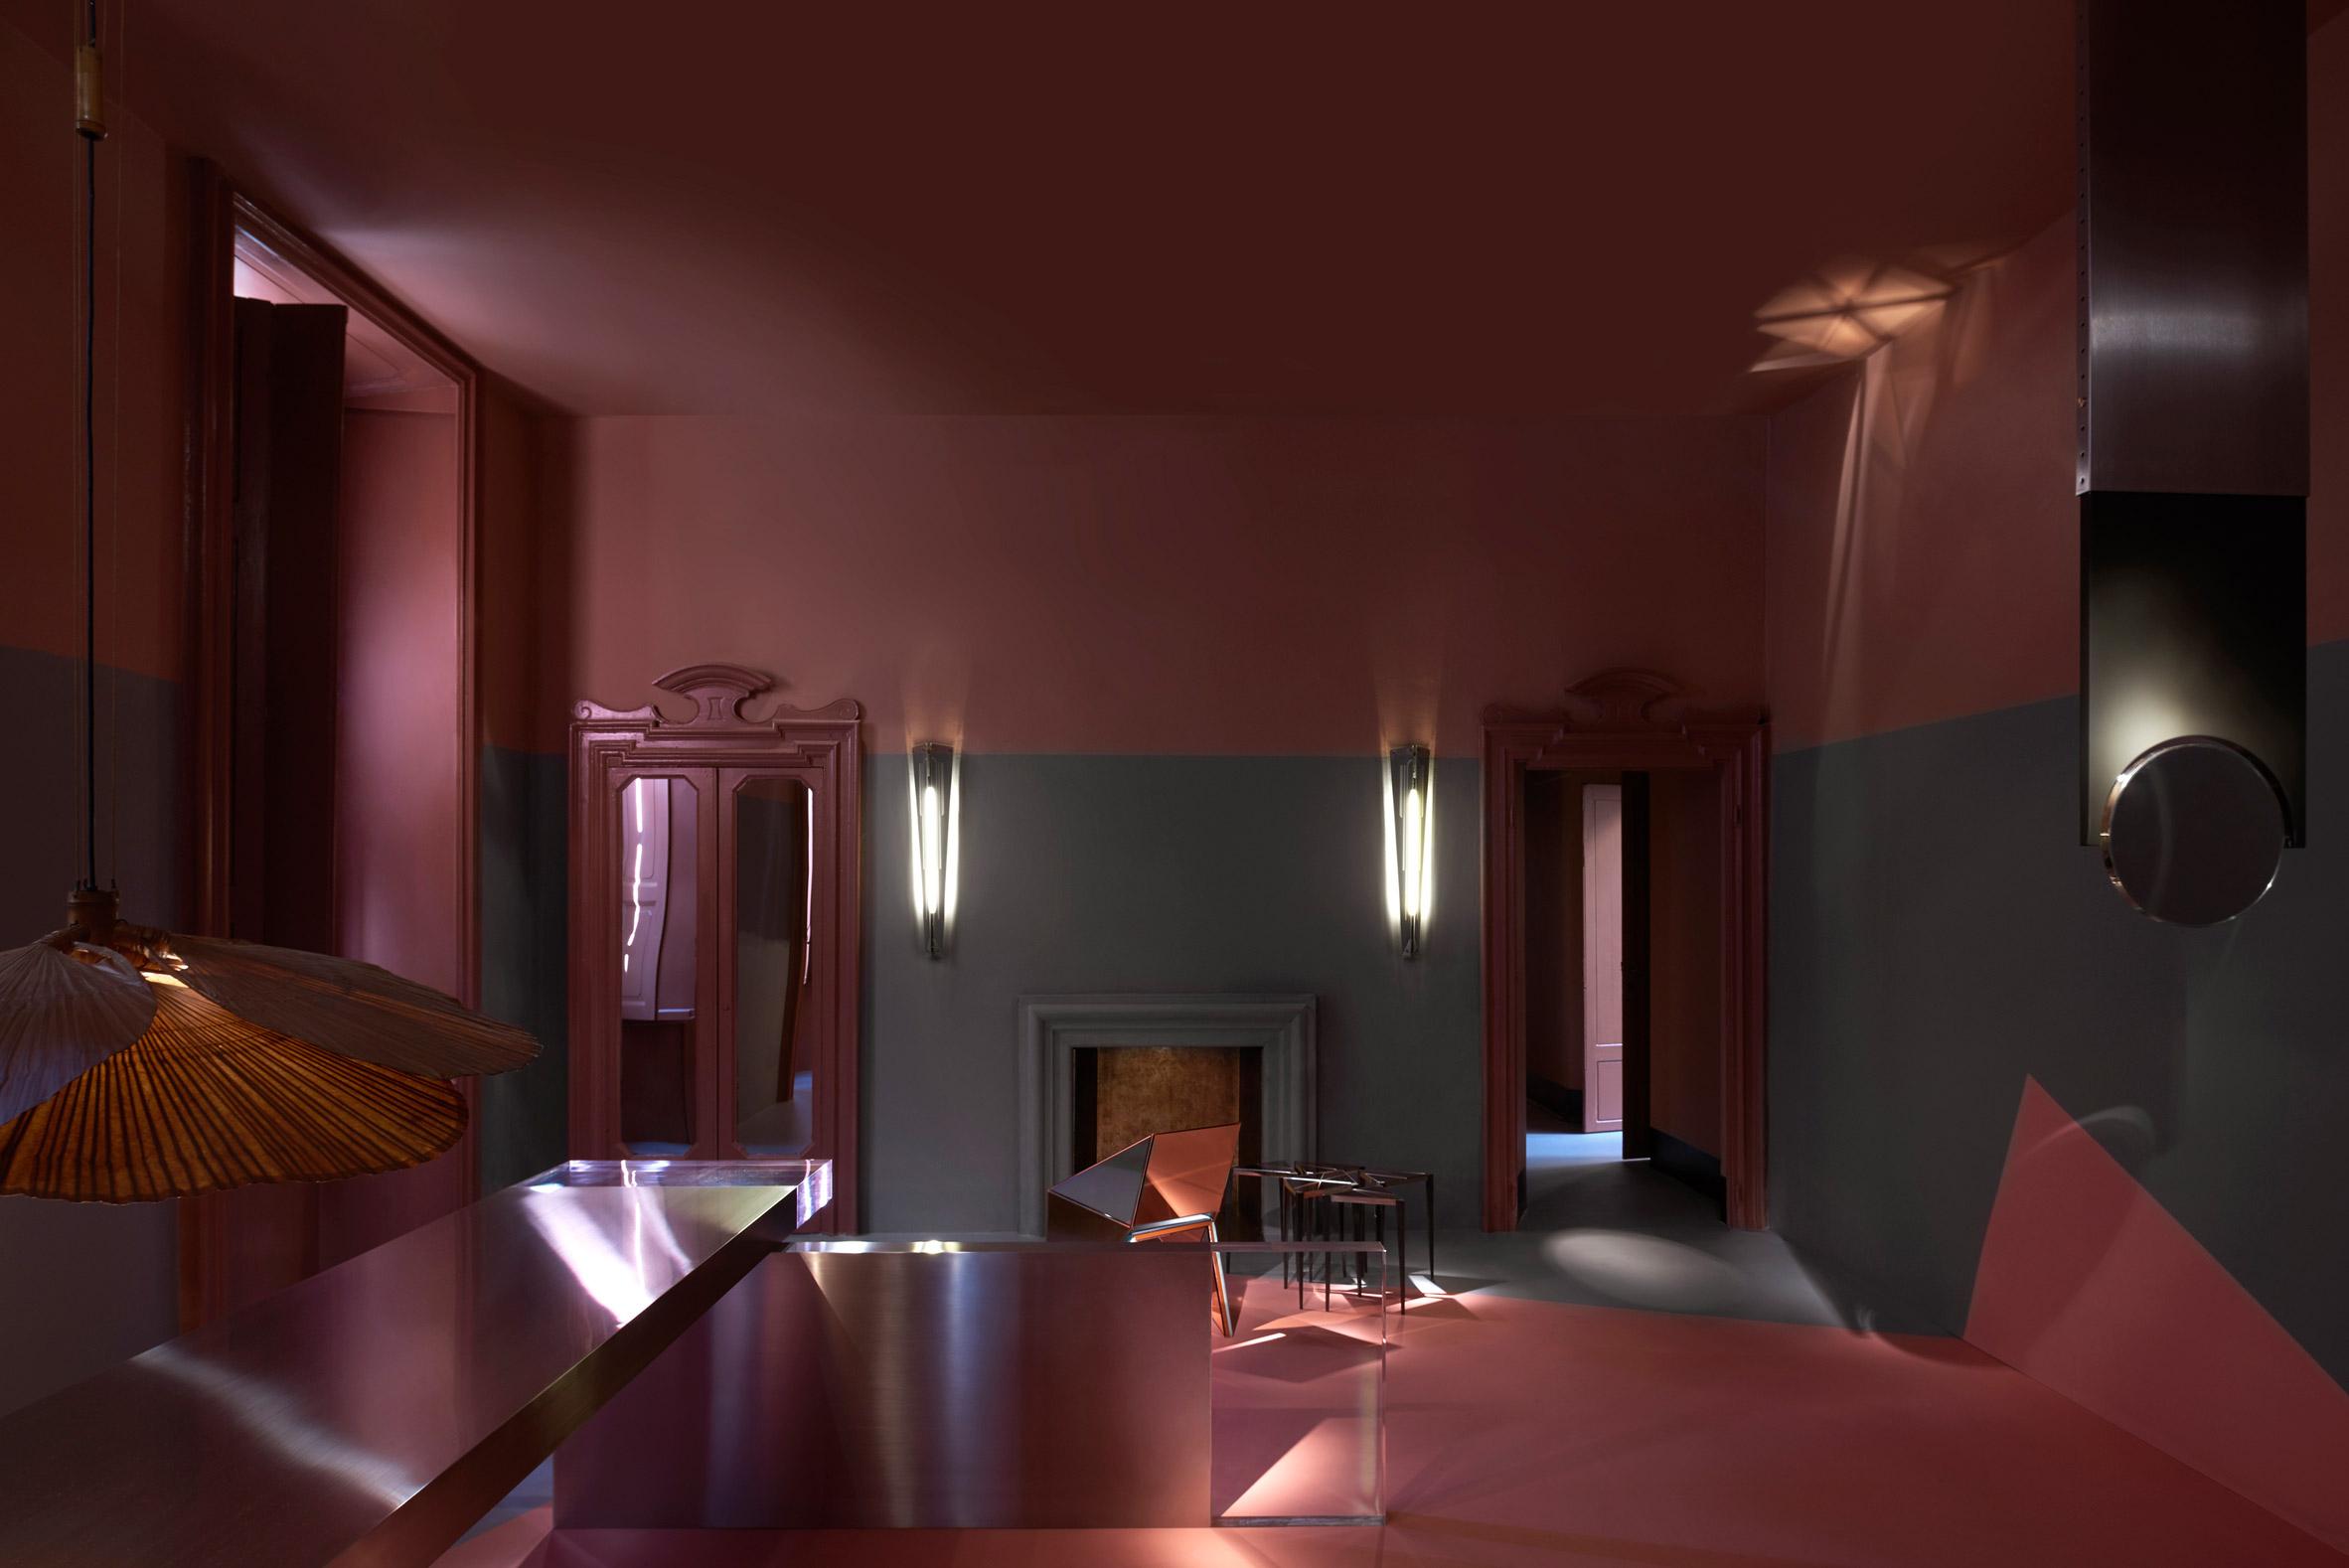 Design eras converge in Dimorestudio's moodily coloured Milan exhibitions